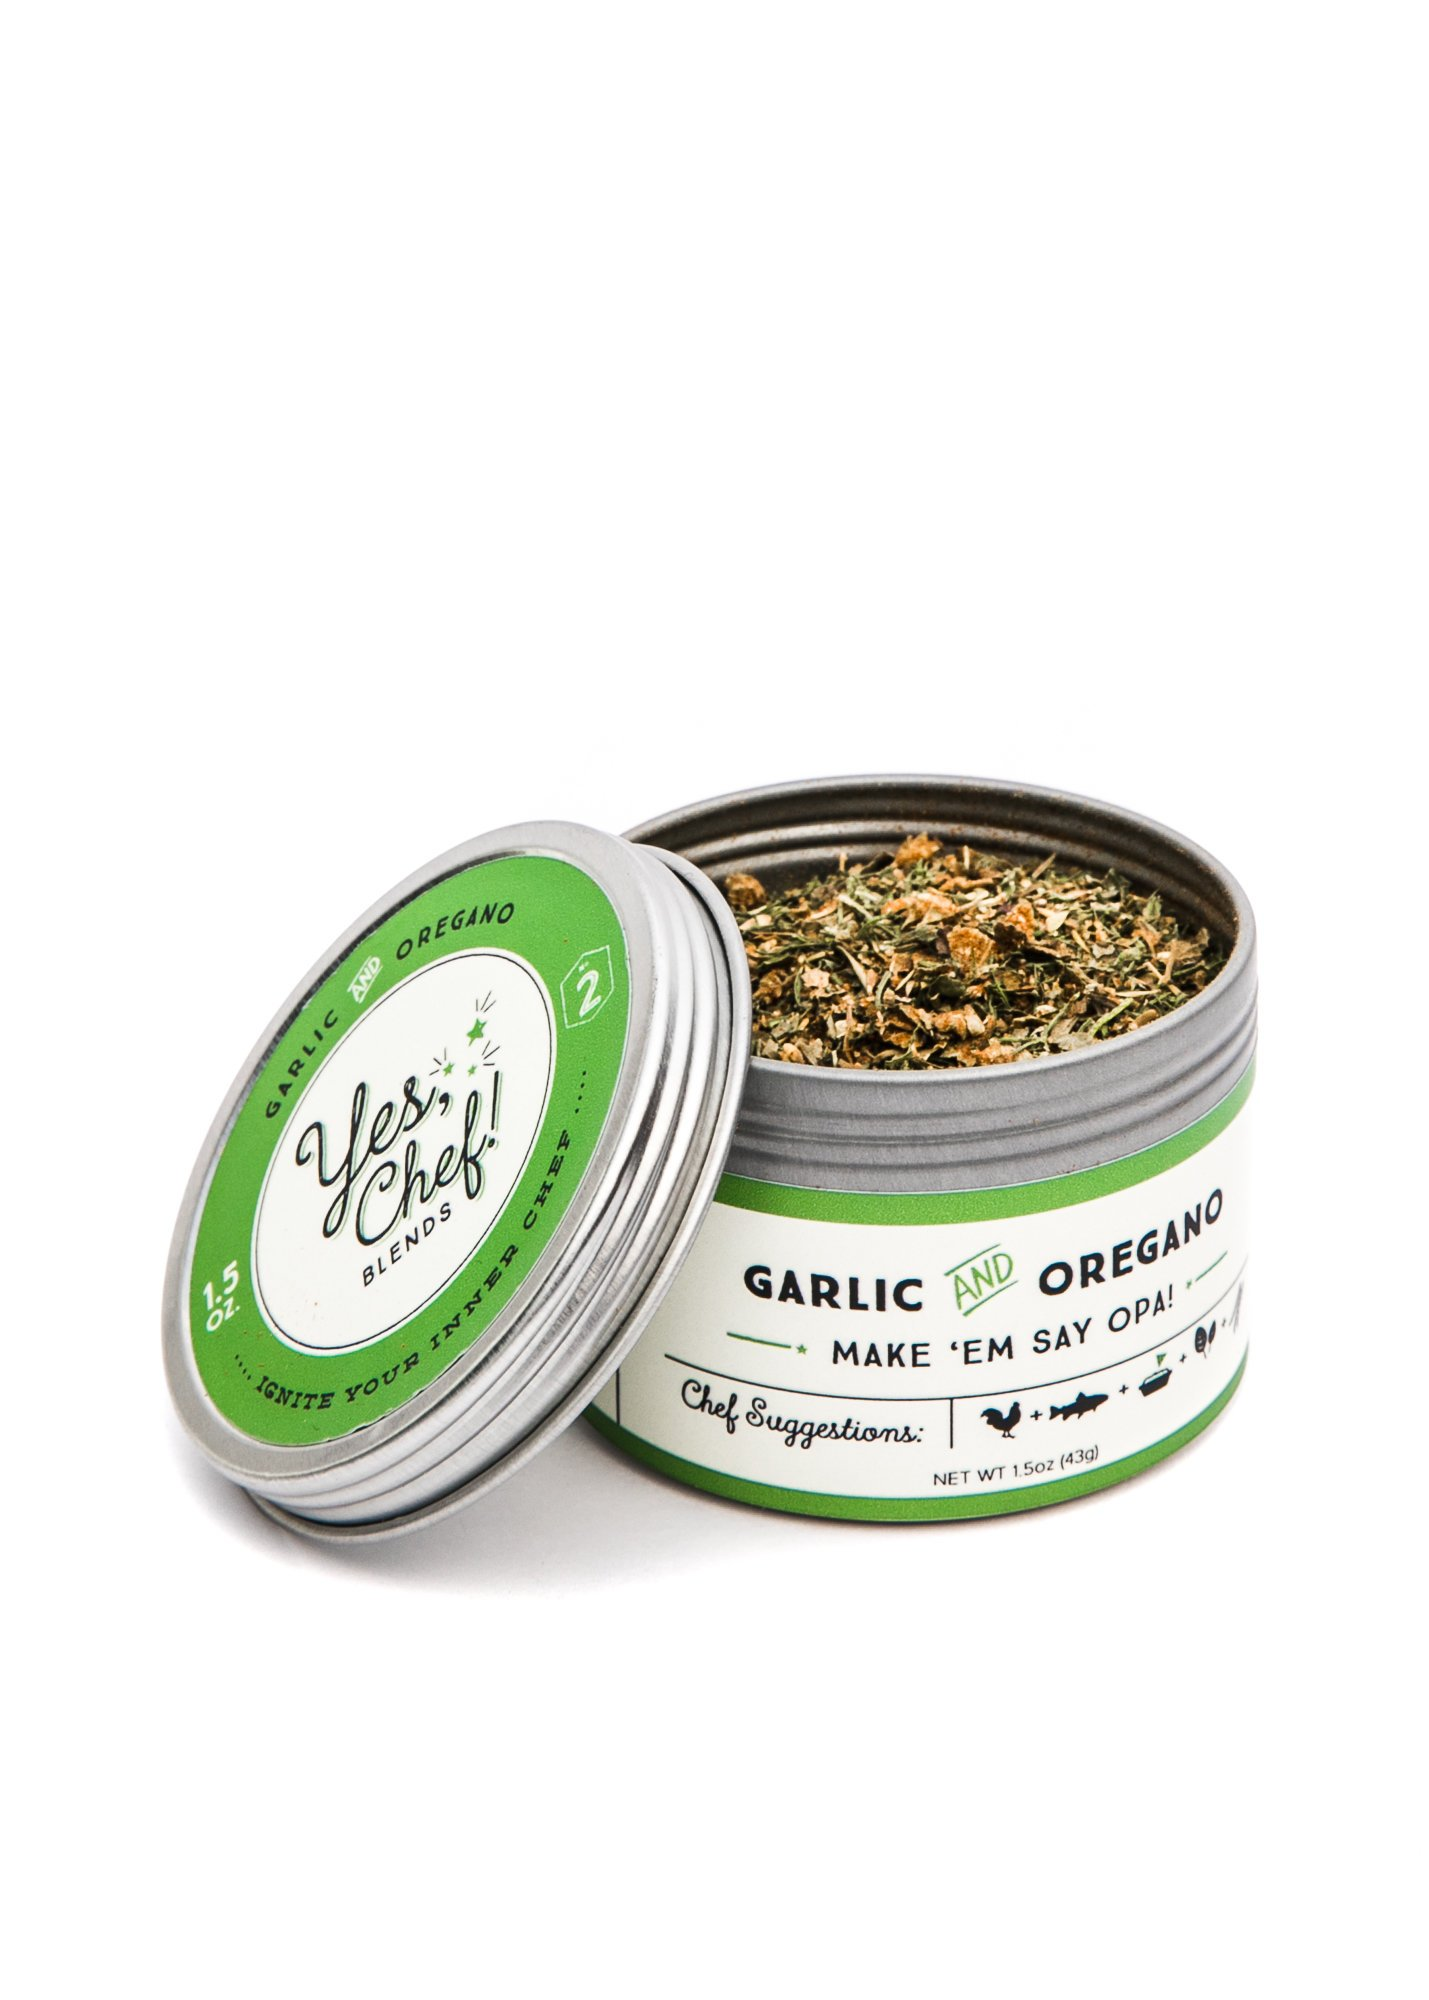 #1 Spice Blend - Make 'Em Say Opa! Greek Seasoning - Sugar + Salt Free (4 Pack) by Yes, Chef! Blends